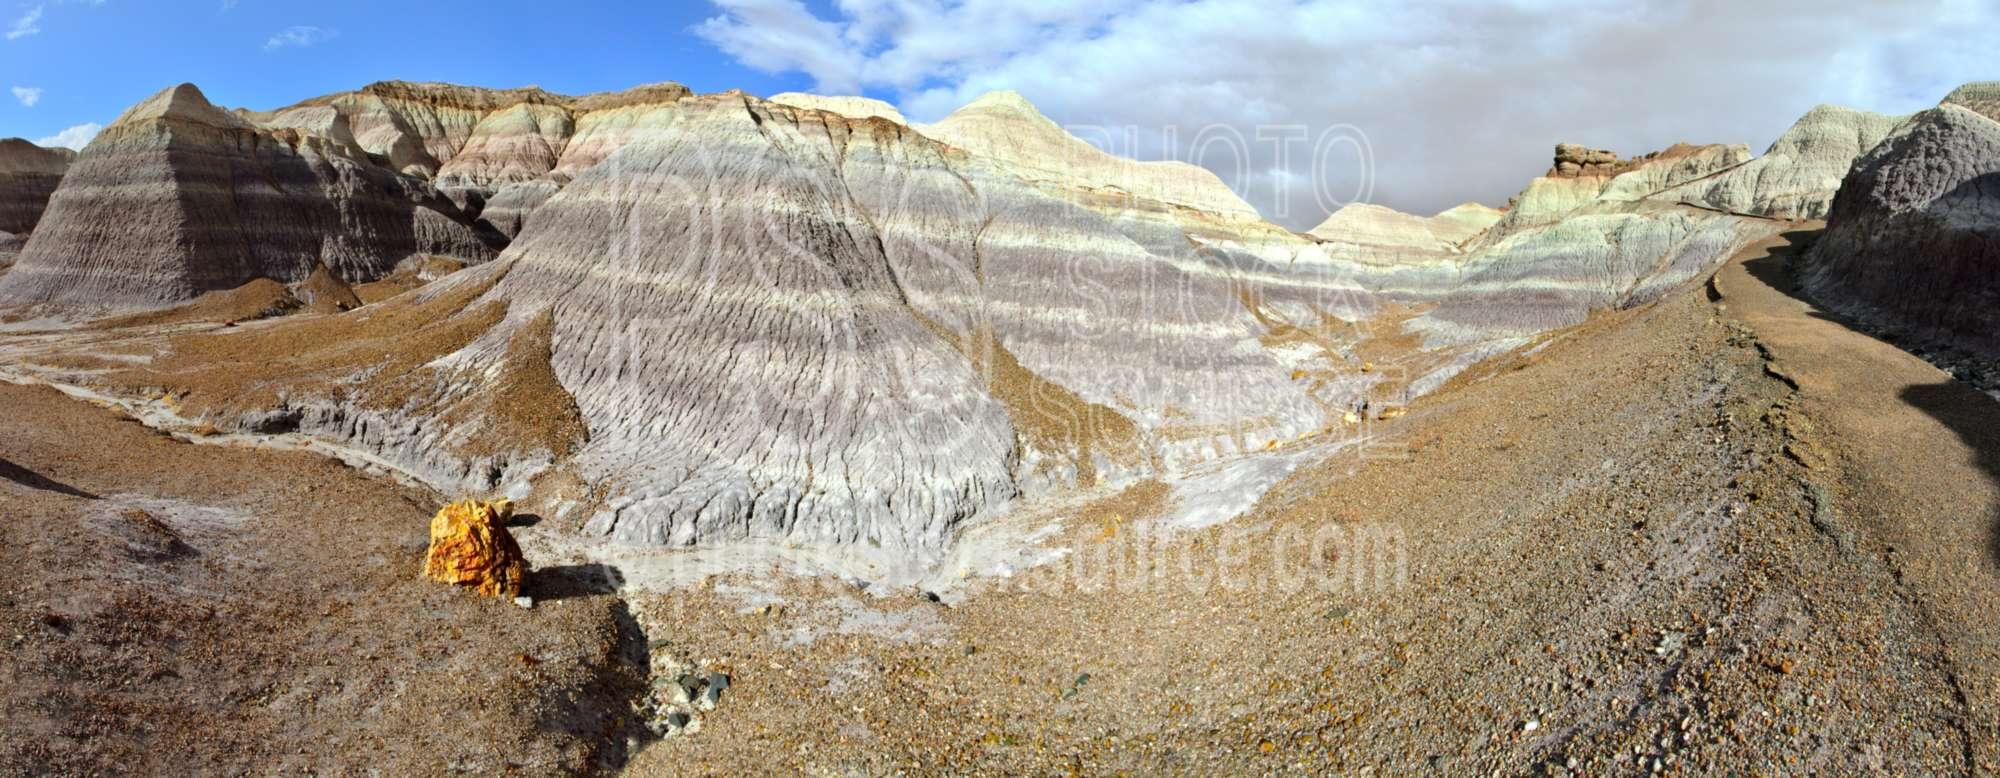 Blue Mesa Trail Petrified Wood